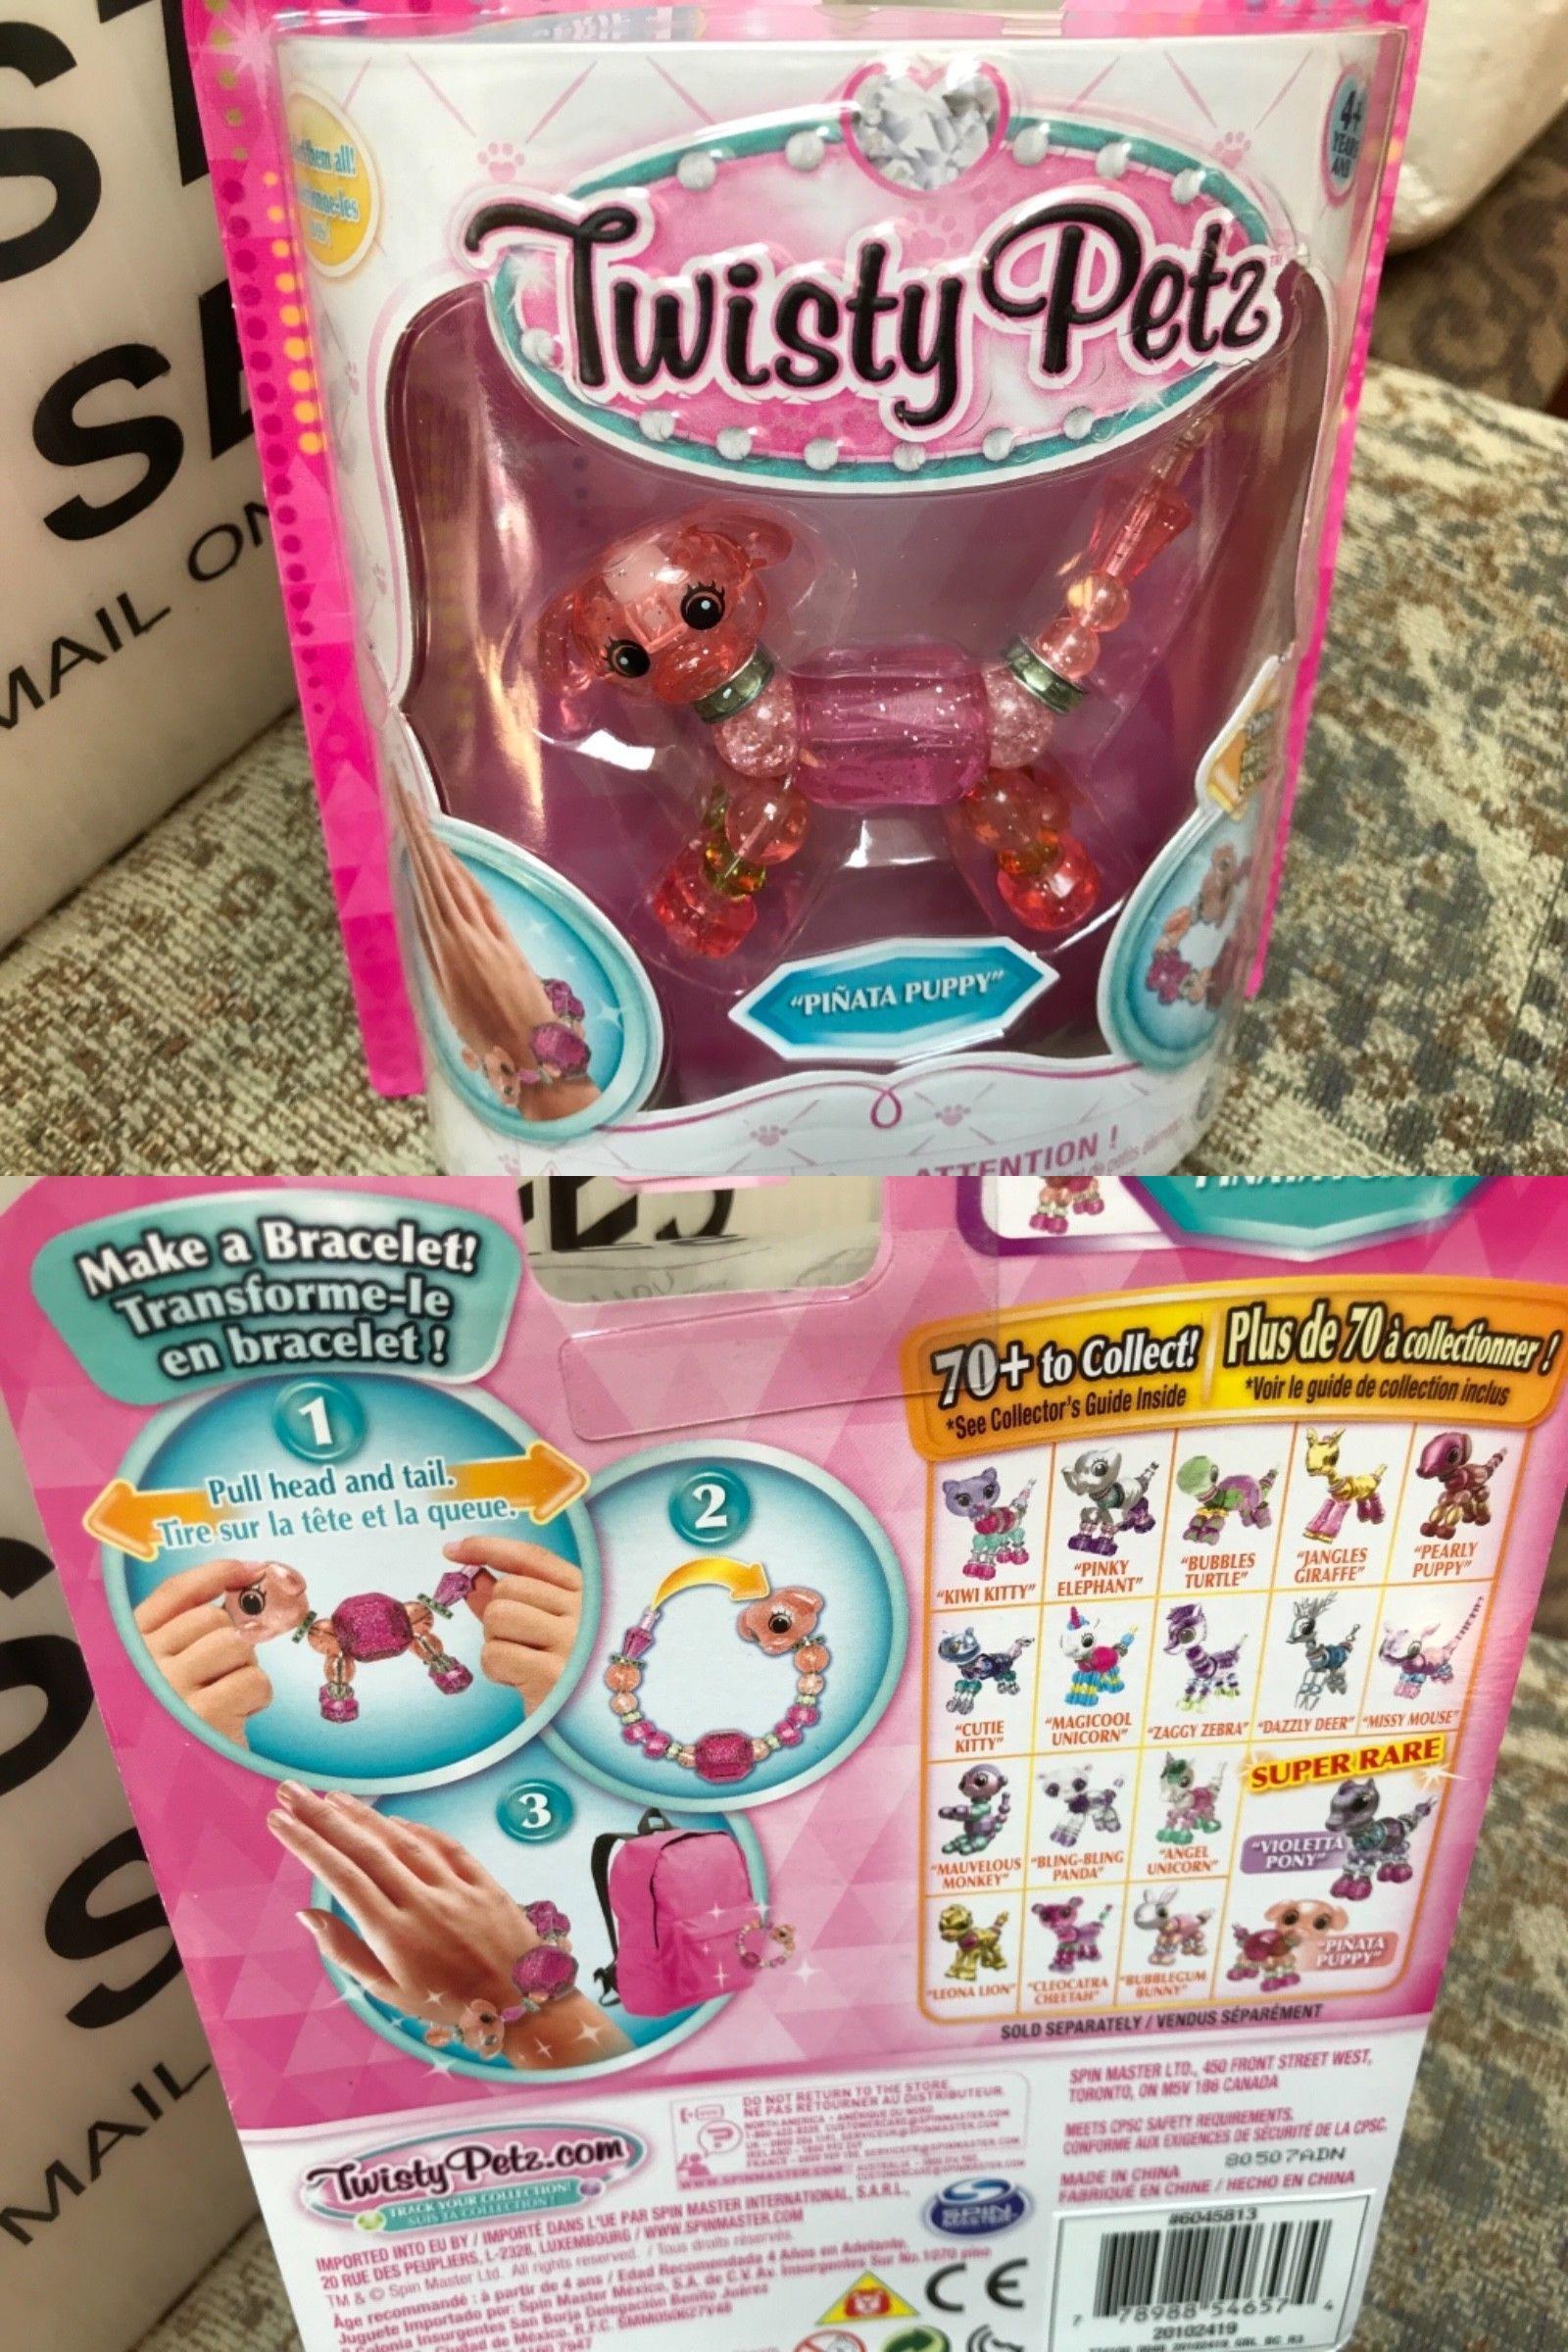 Hair Accessories Toys & Hobbies Twisty Petz Pets Super Rare Jojo Siwa Bow Bowbow Transform Pet To Bracelet Rare